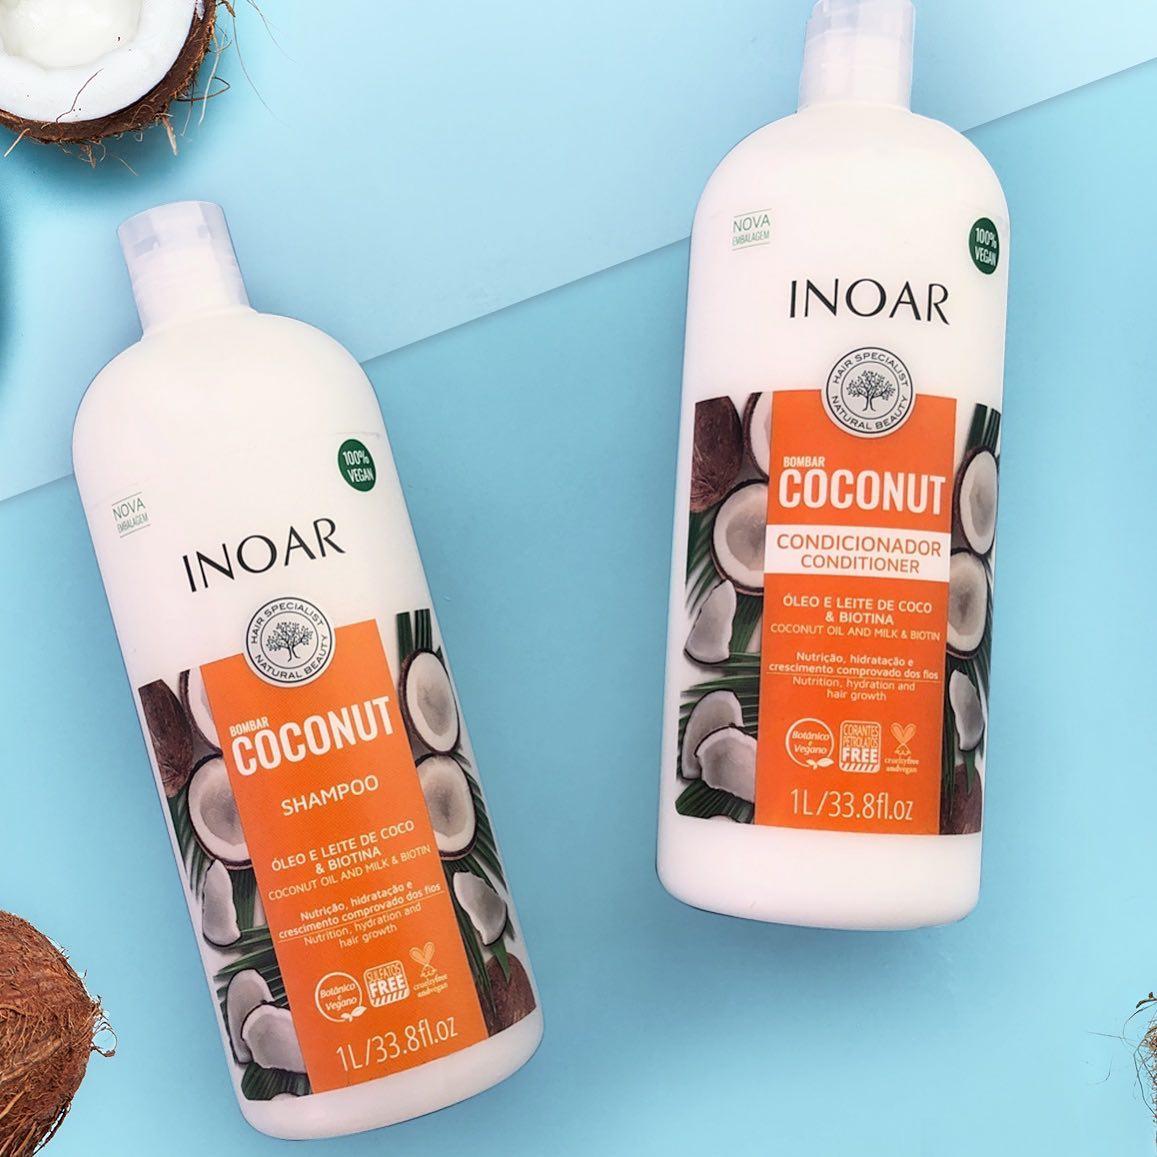 Inoar Coconut Shampoo & Conditioner We Love!